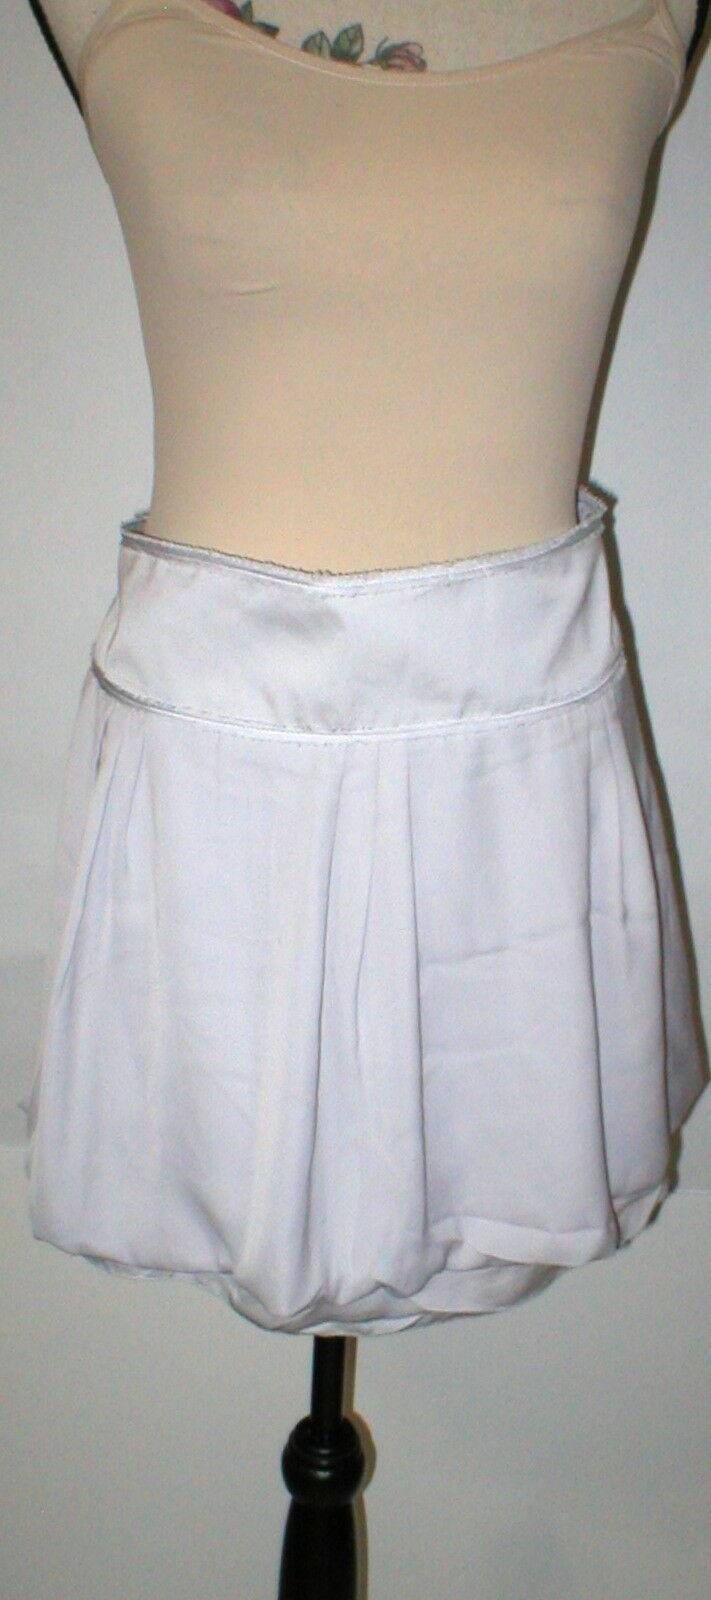 NEW Womens Gap Bubble $50 Skirt NWT 14 Mini Starlight Very light Grayish Purple